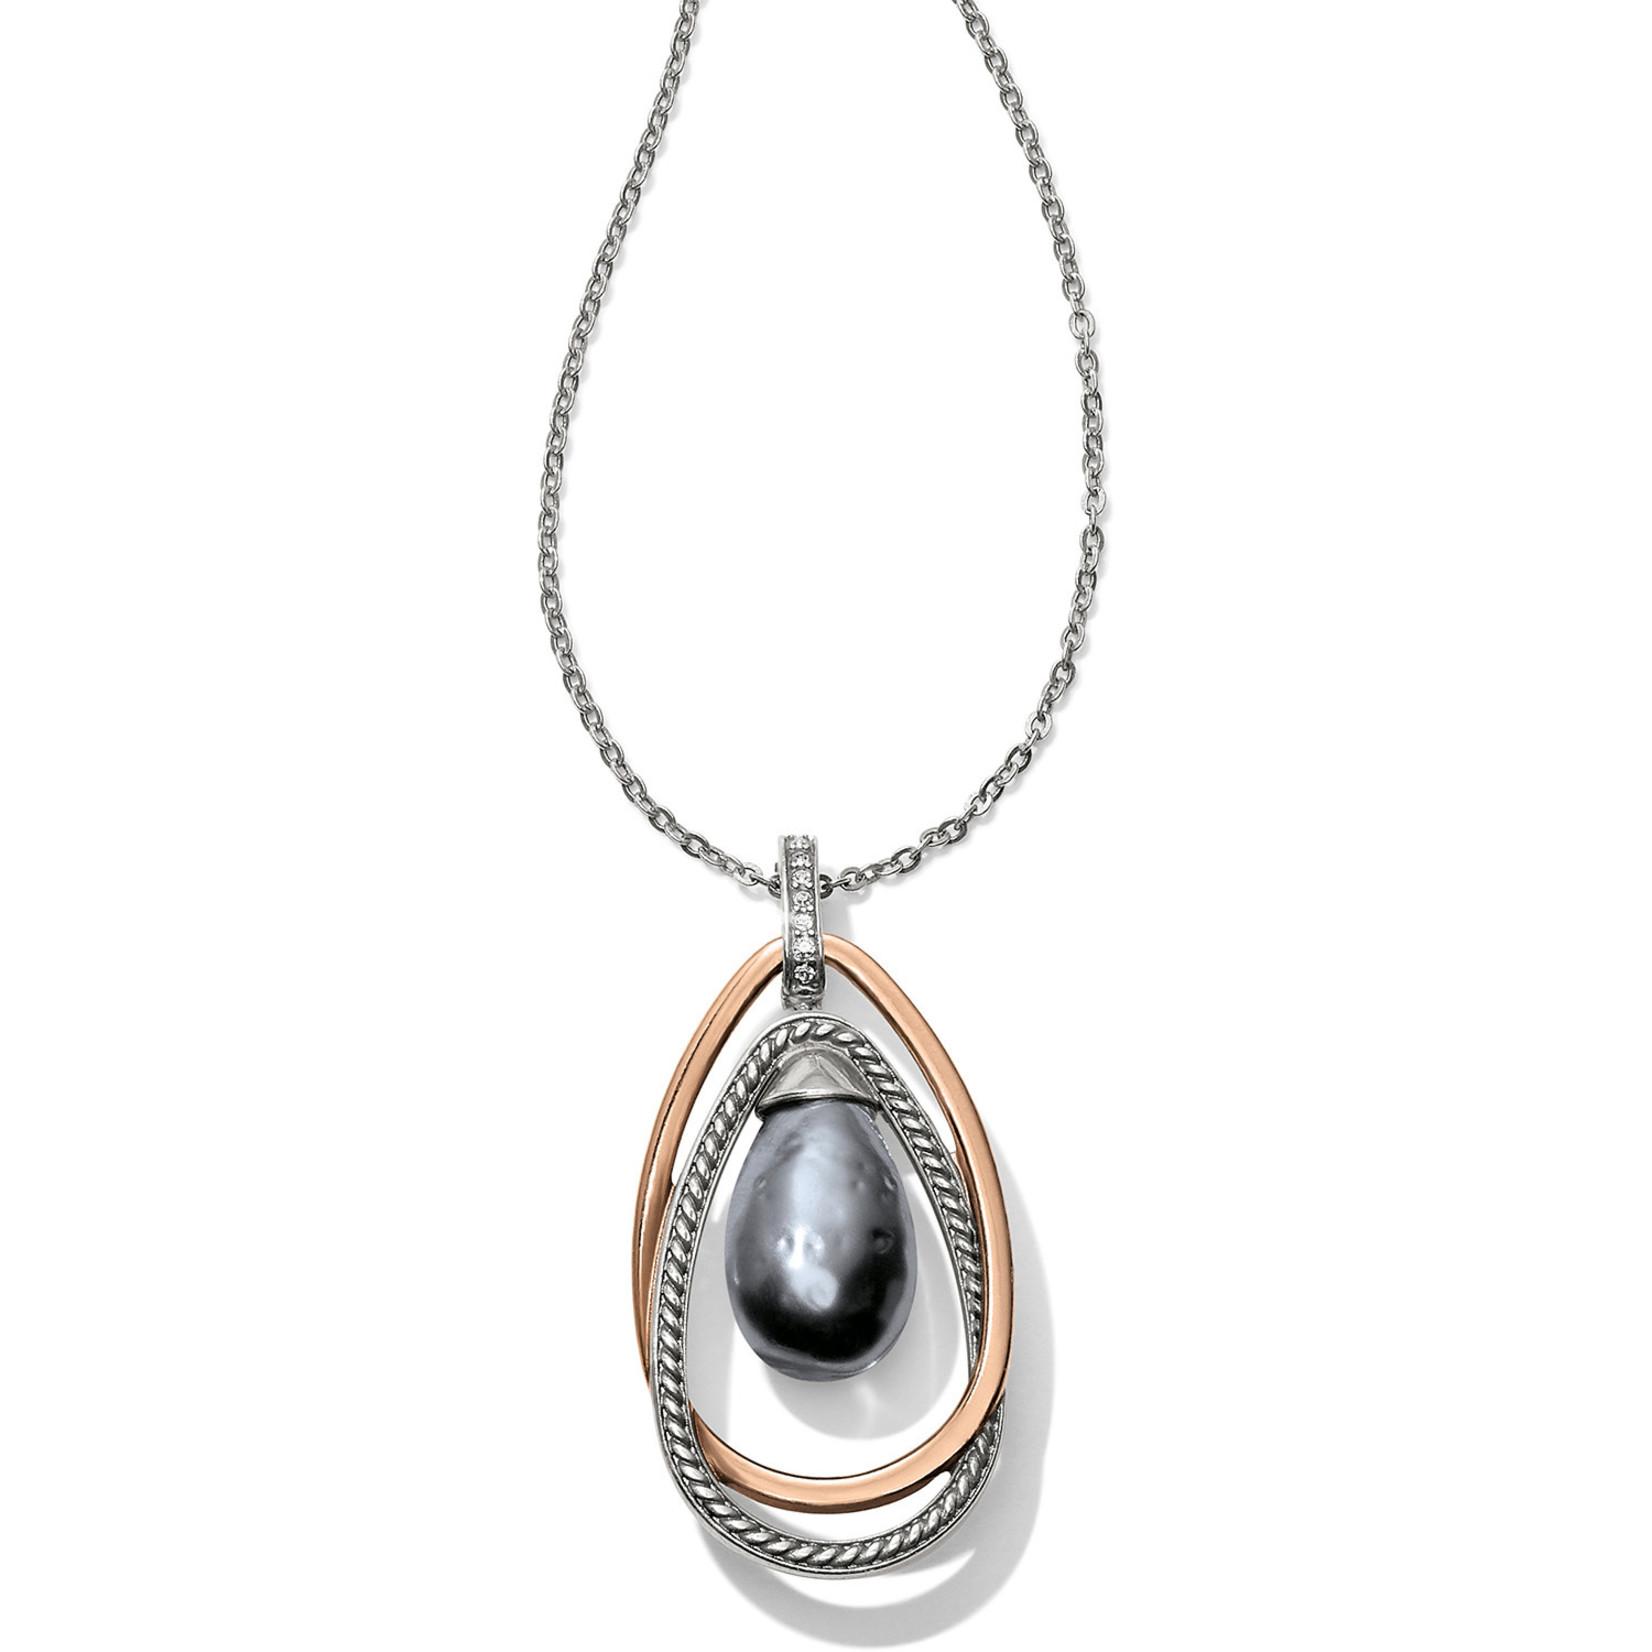 Brighton Neptune's Rings Gray Pearl Pendant Necklace